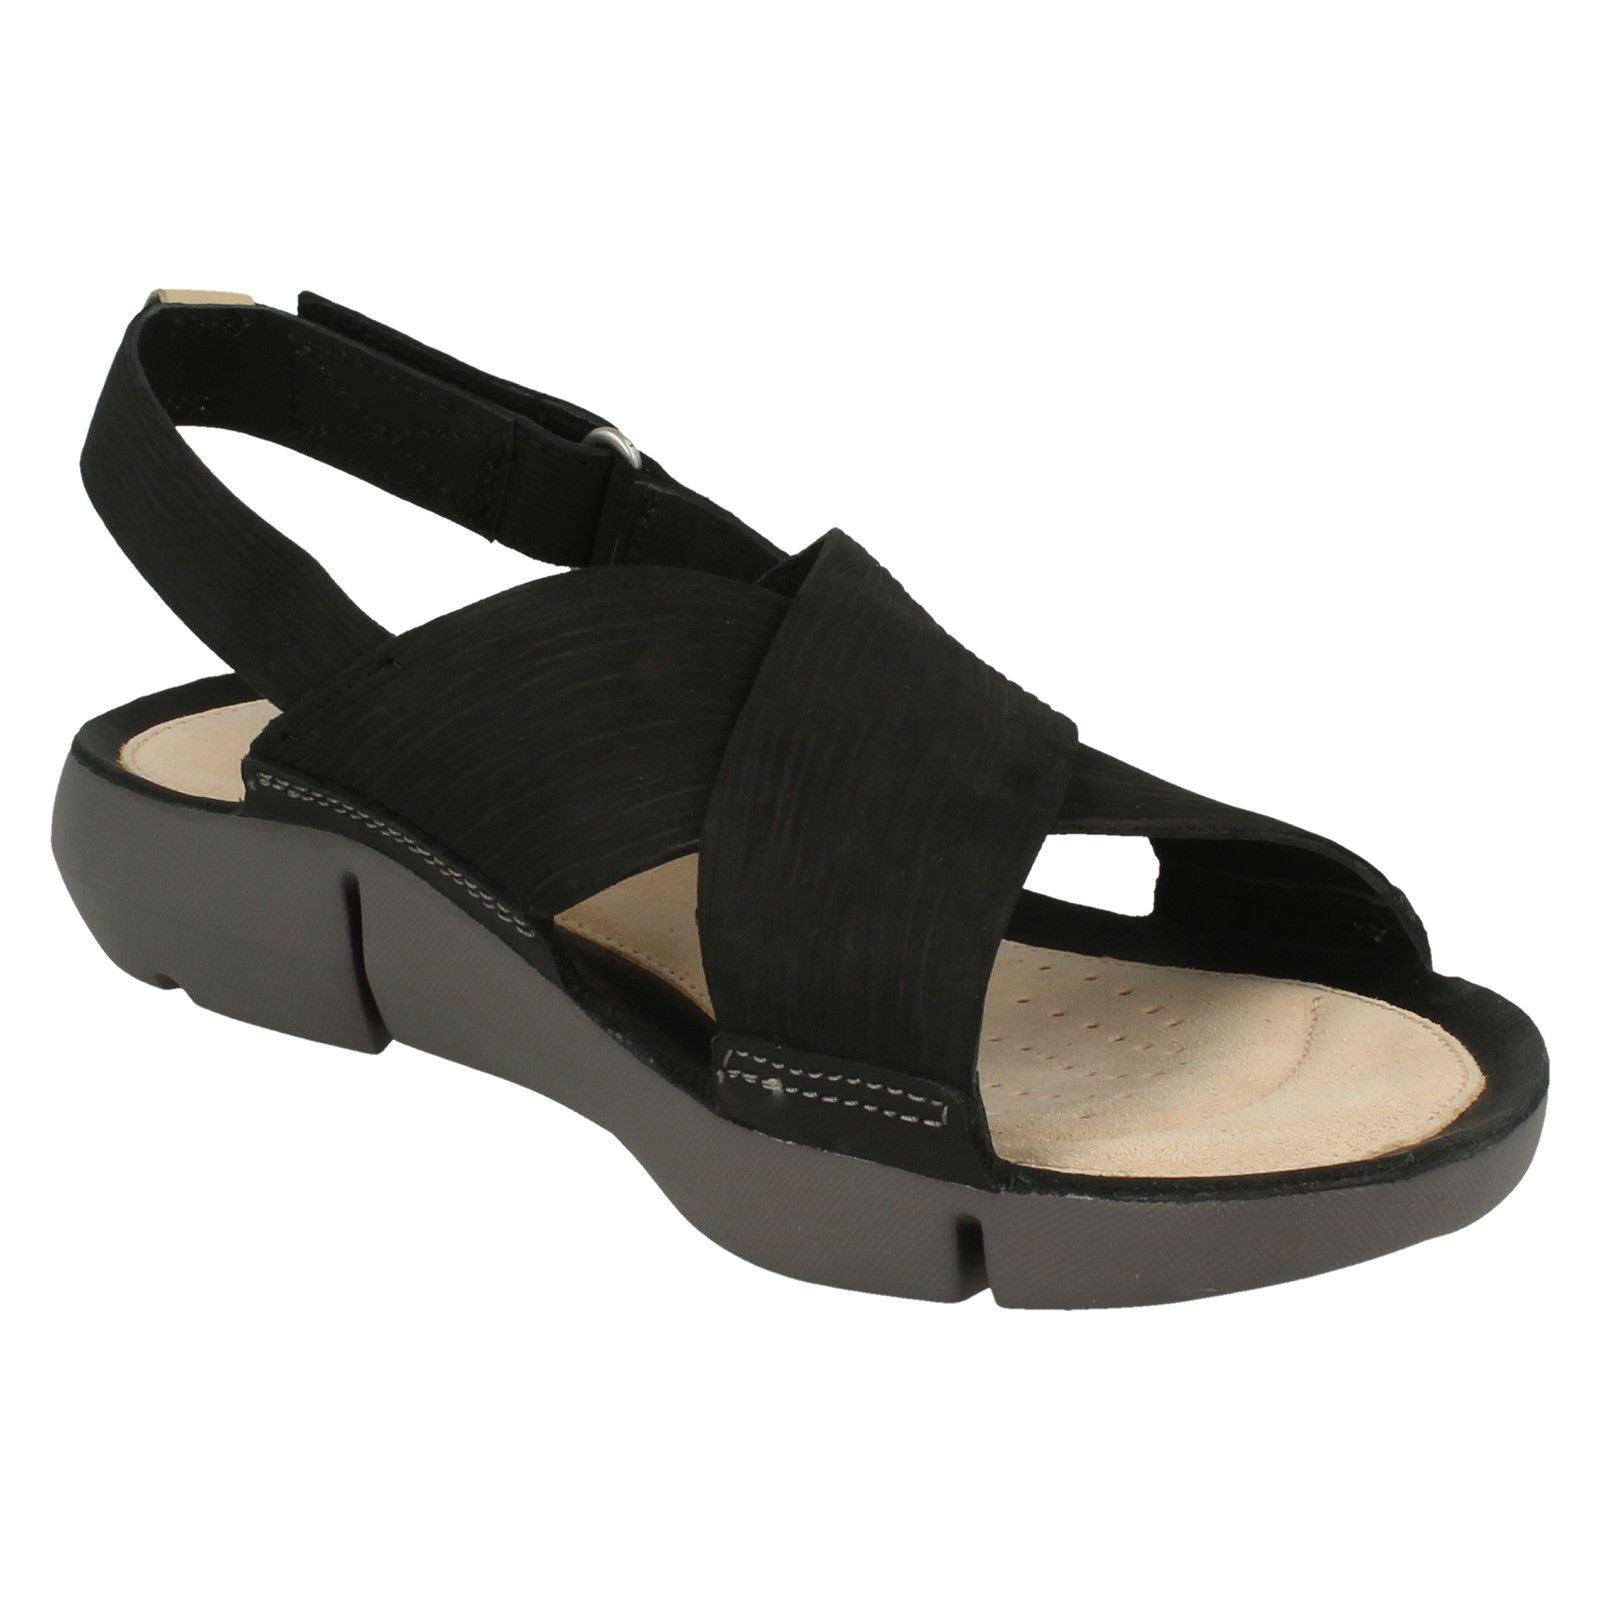 Details zu Ladies Clarks Slingback Flat Sandals Tri Chloe